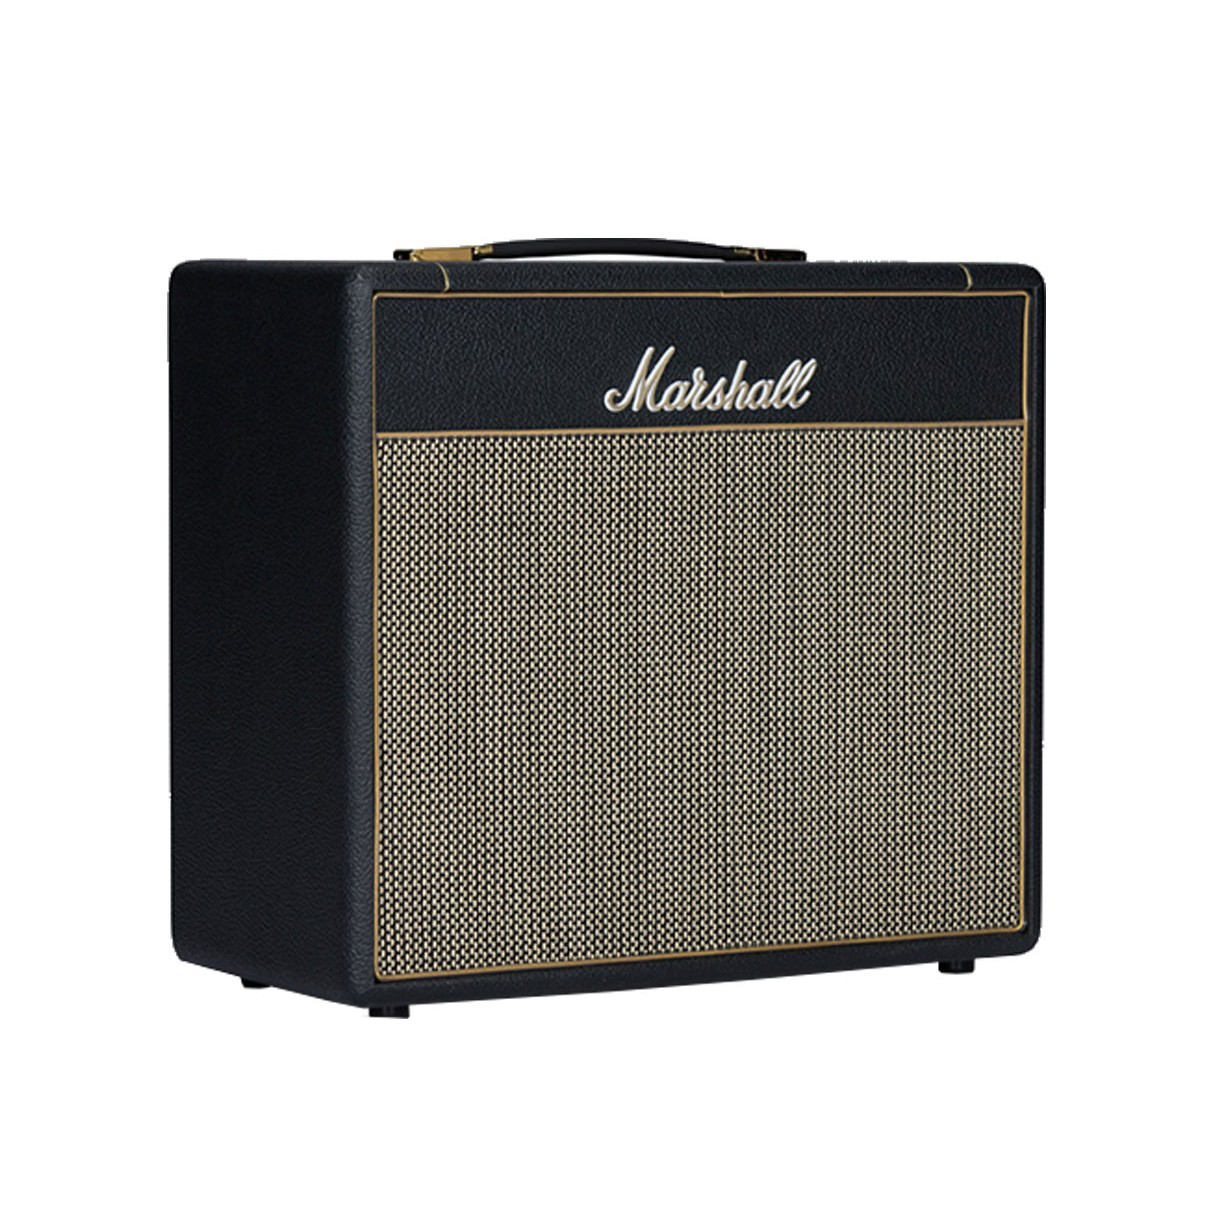 marshall sv20c 20 watt plexi 1x10 combo amp. Black Bedroom Furniture Sets. Home Design Ideas